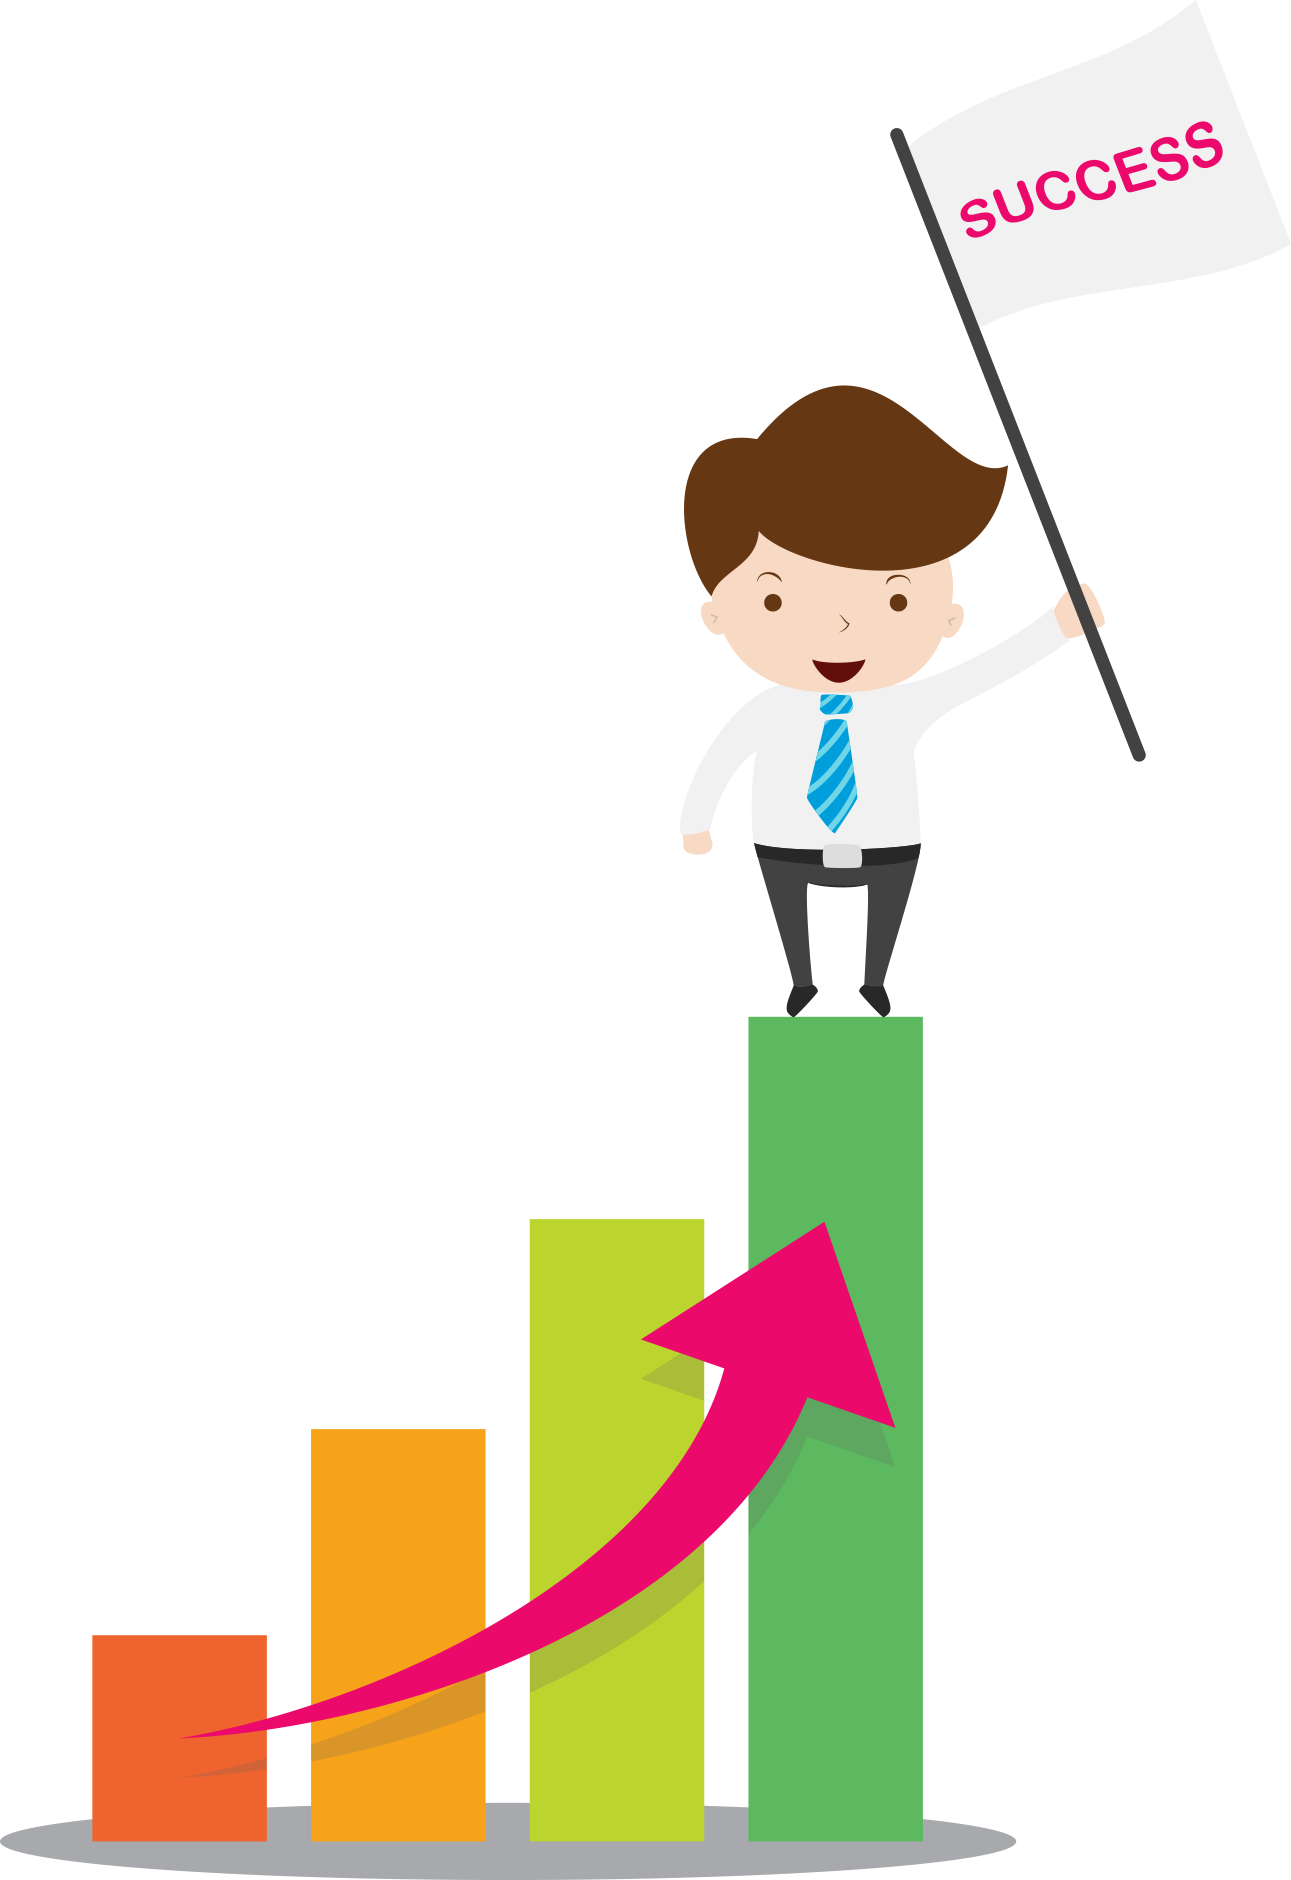 Special Education 4 Teaching Best Practices Edmentum Blog >> 5 Principles Of Professional Development For Teachers Professional